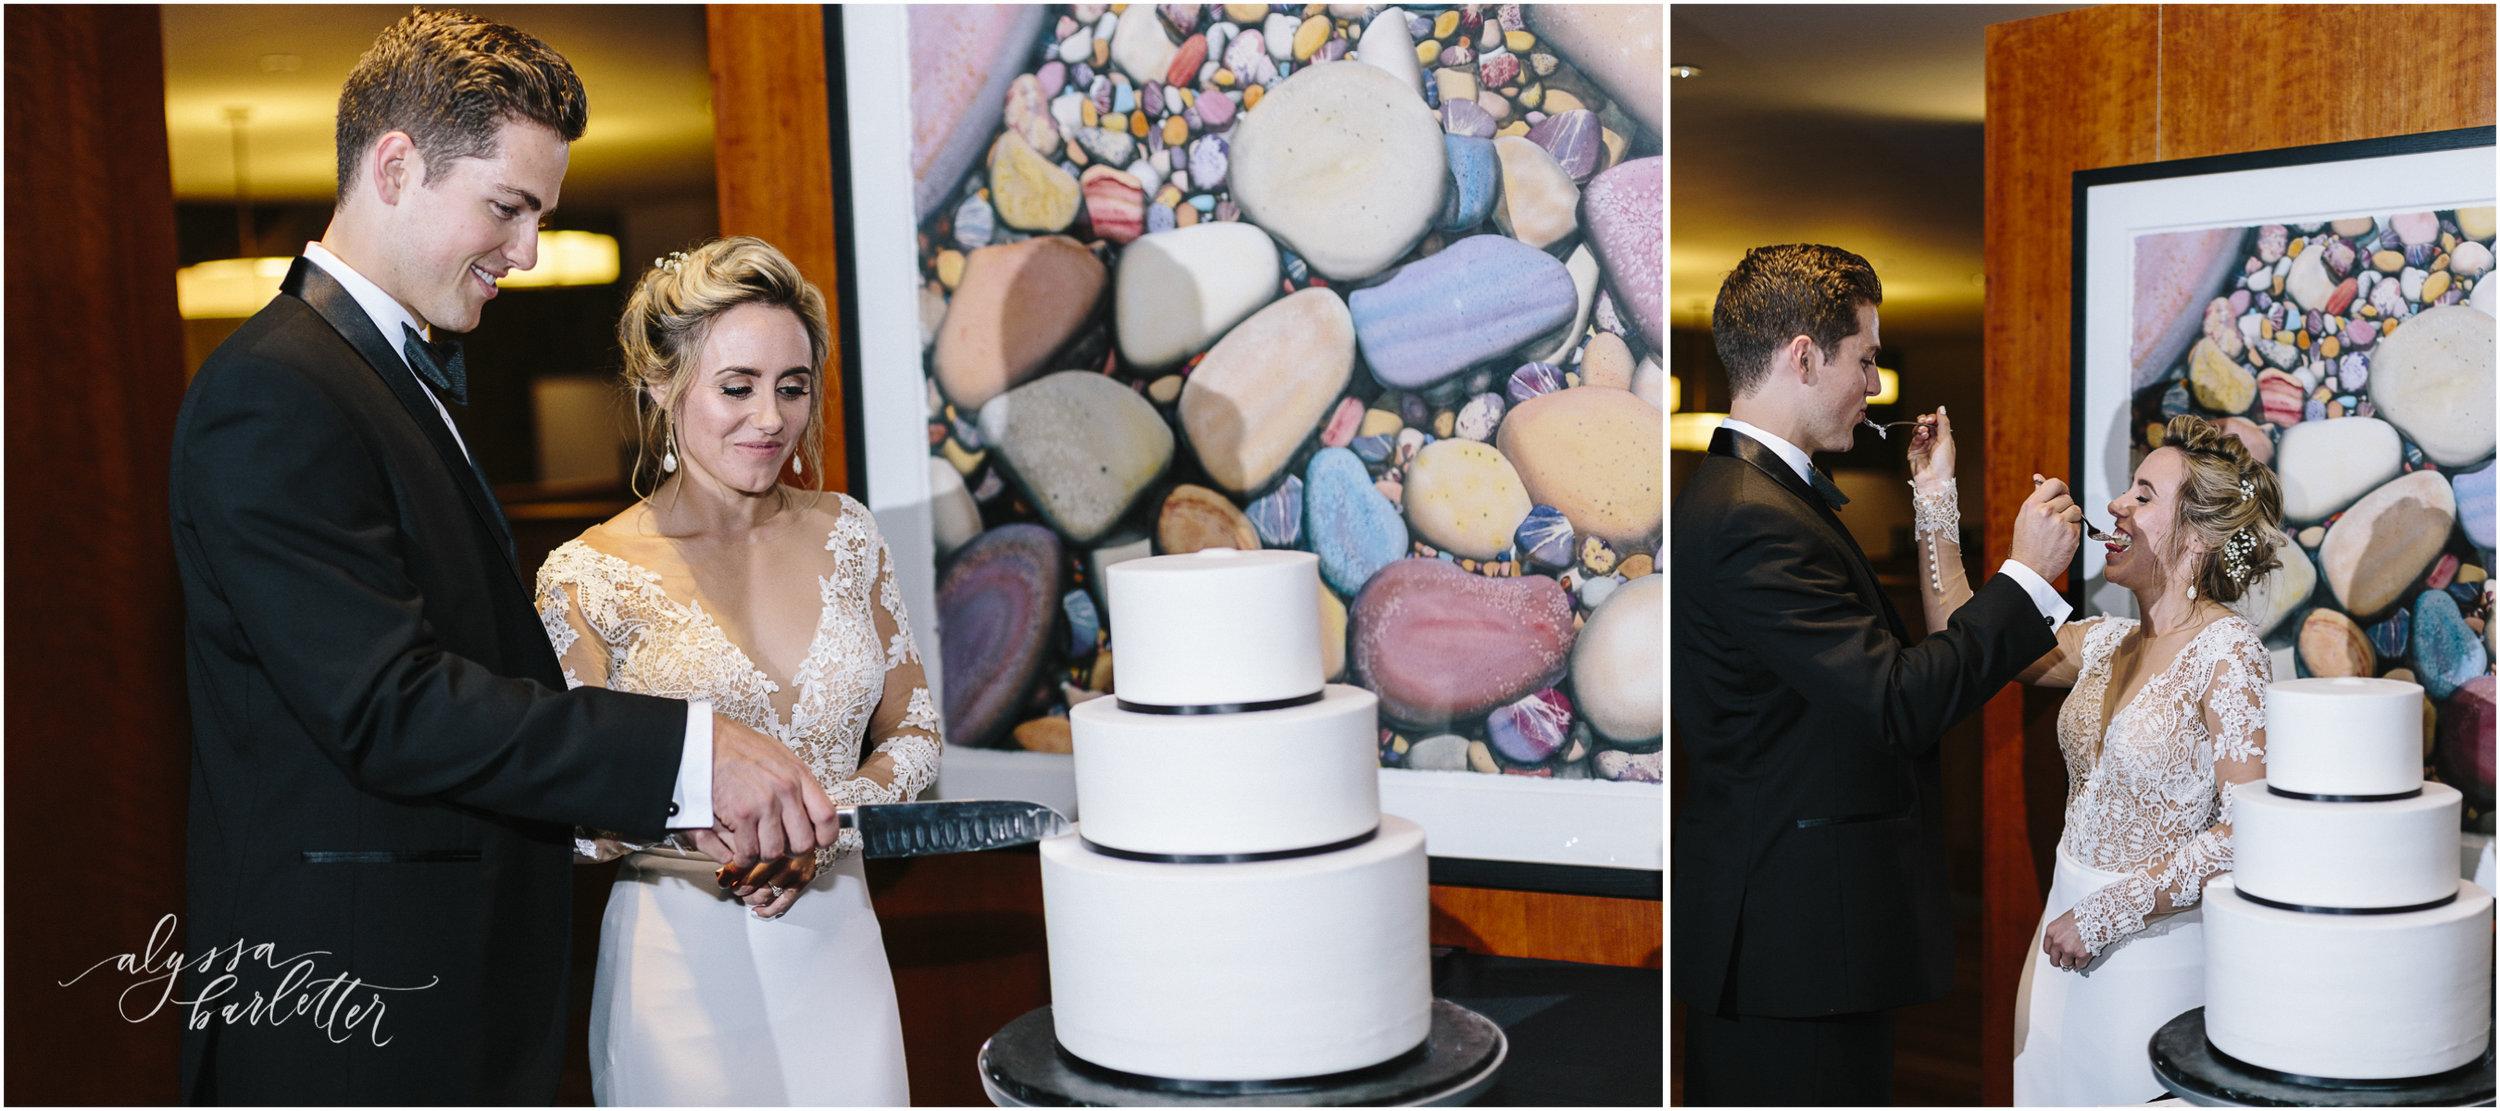 alyssa barletter photography fayetteville arkansas wedding photos micah and colin-1-57.jpg